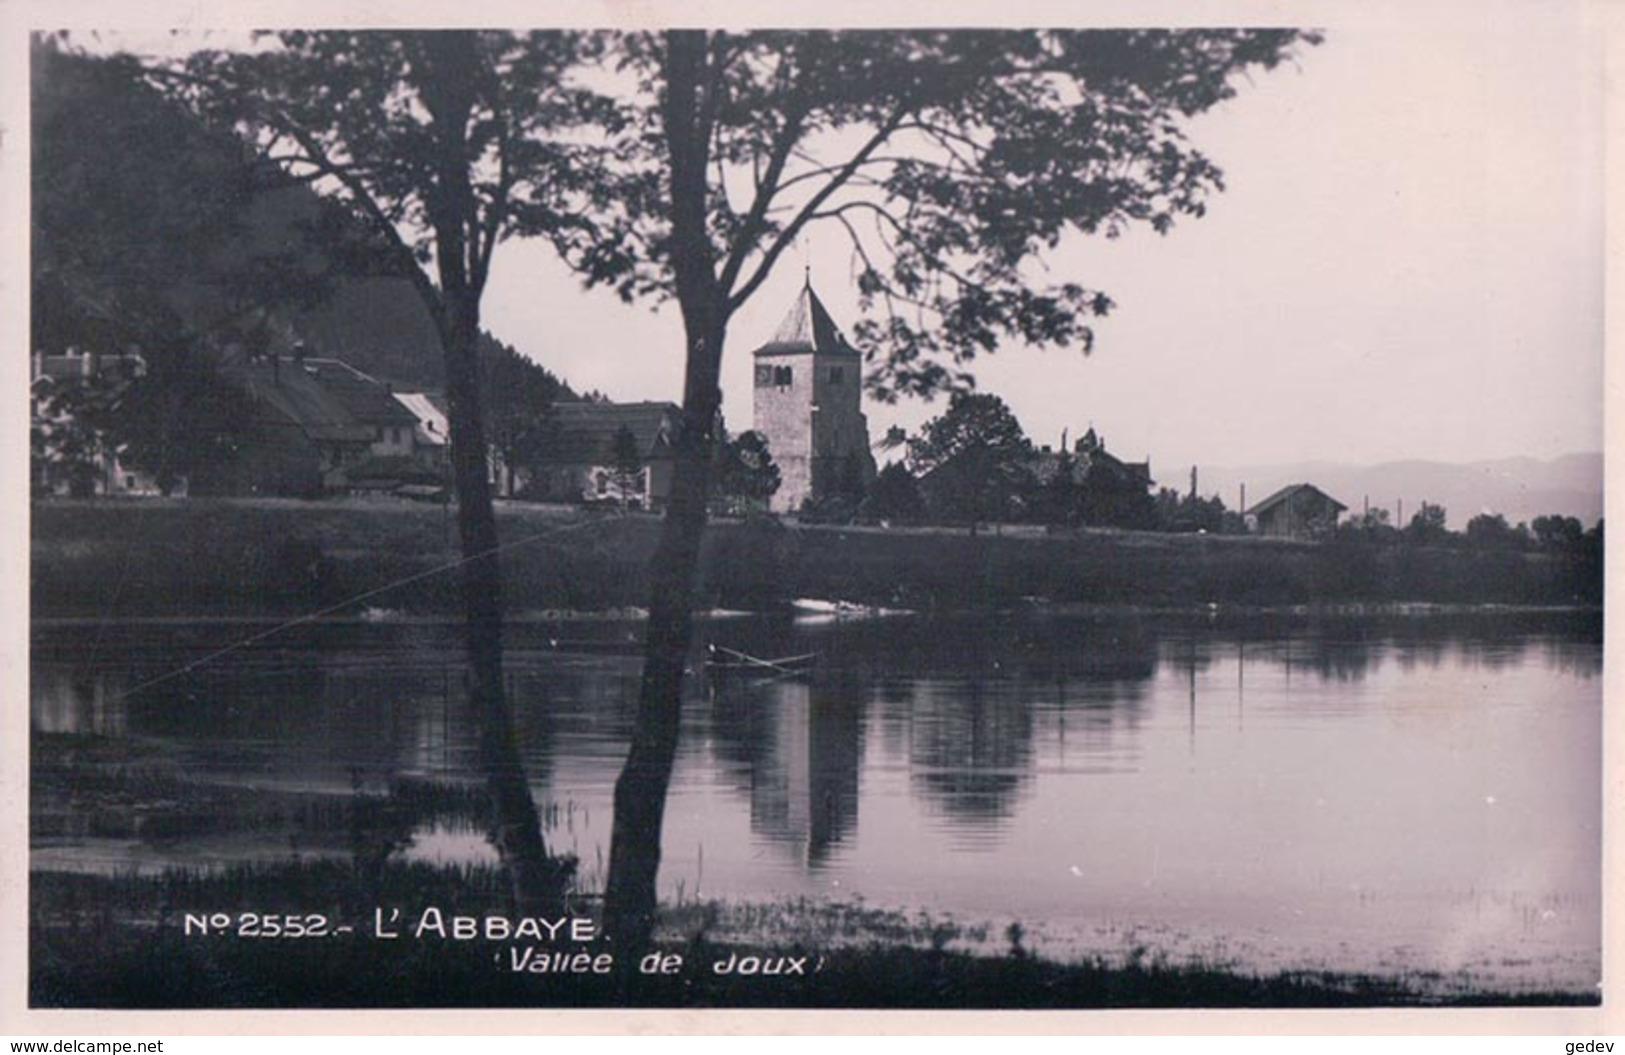 Vallée De Joux, L'Abbaye Vu Du Lac (2552) - VD Vaud